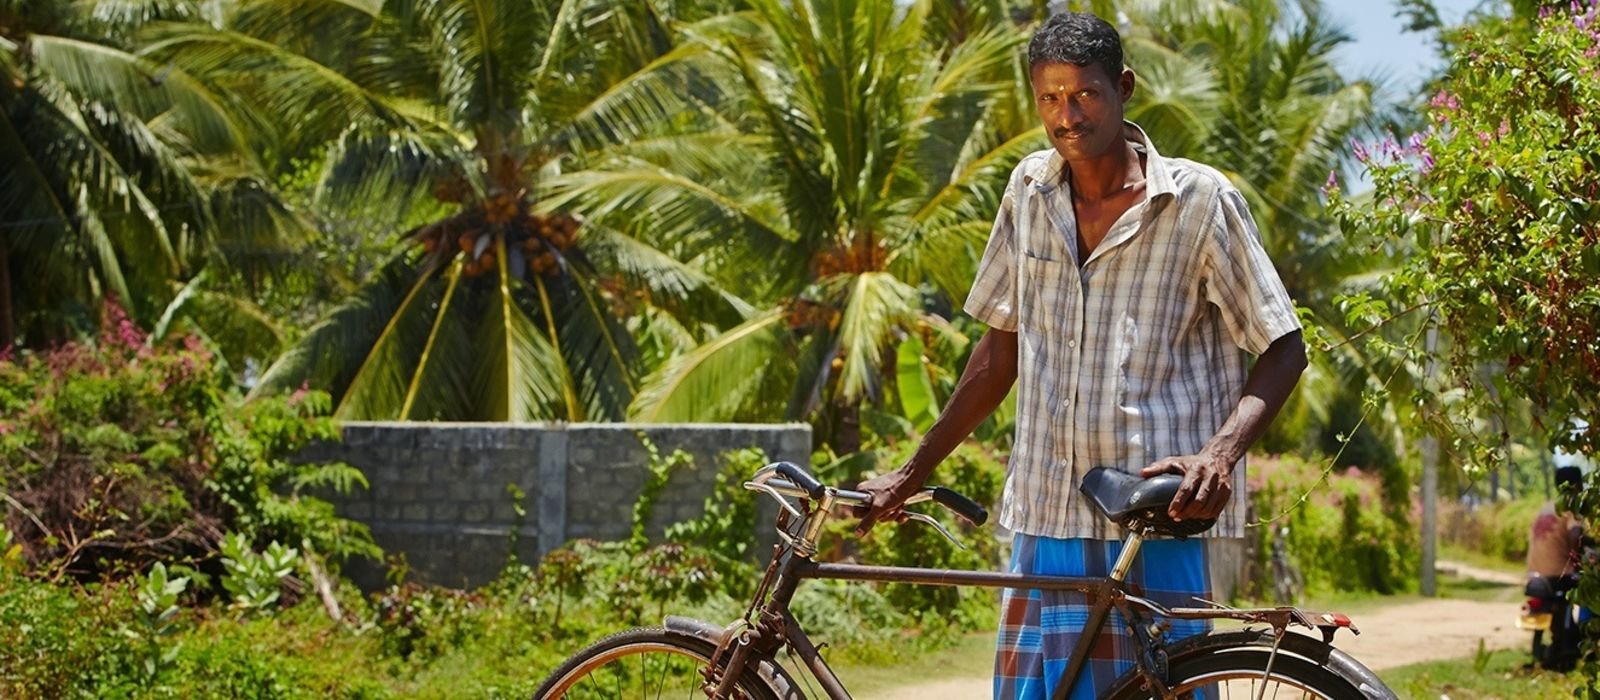 Luxuriös und hautnah – Große Sri Lanka Rundreise Urlaub 2